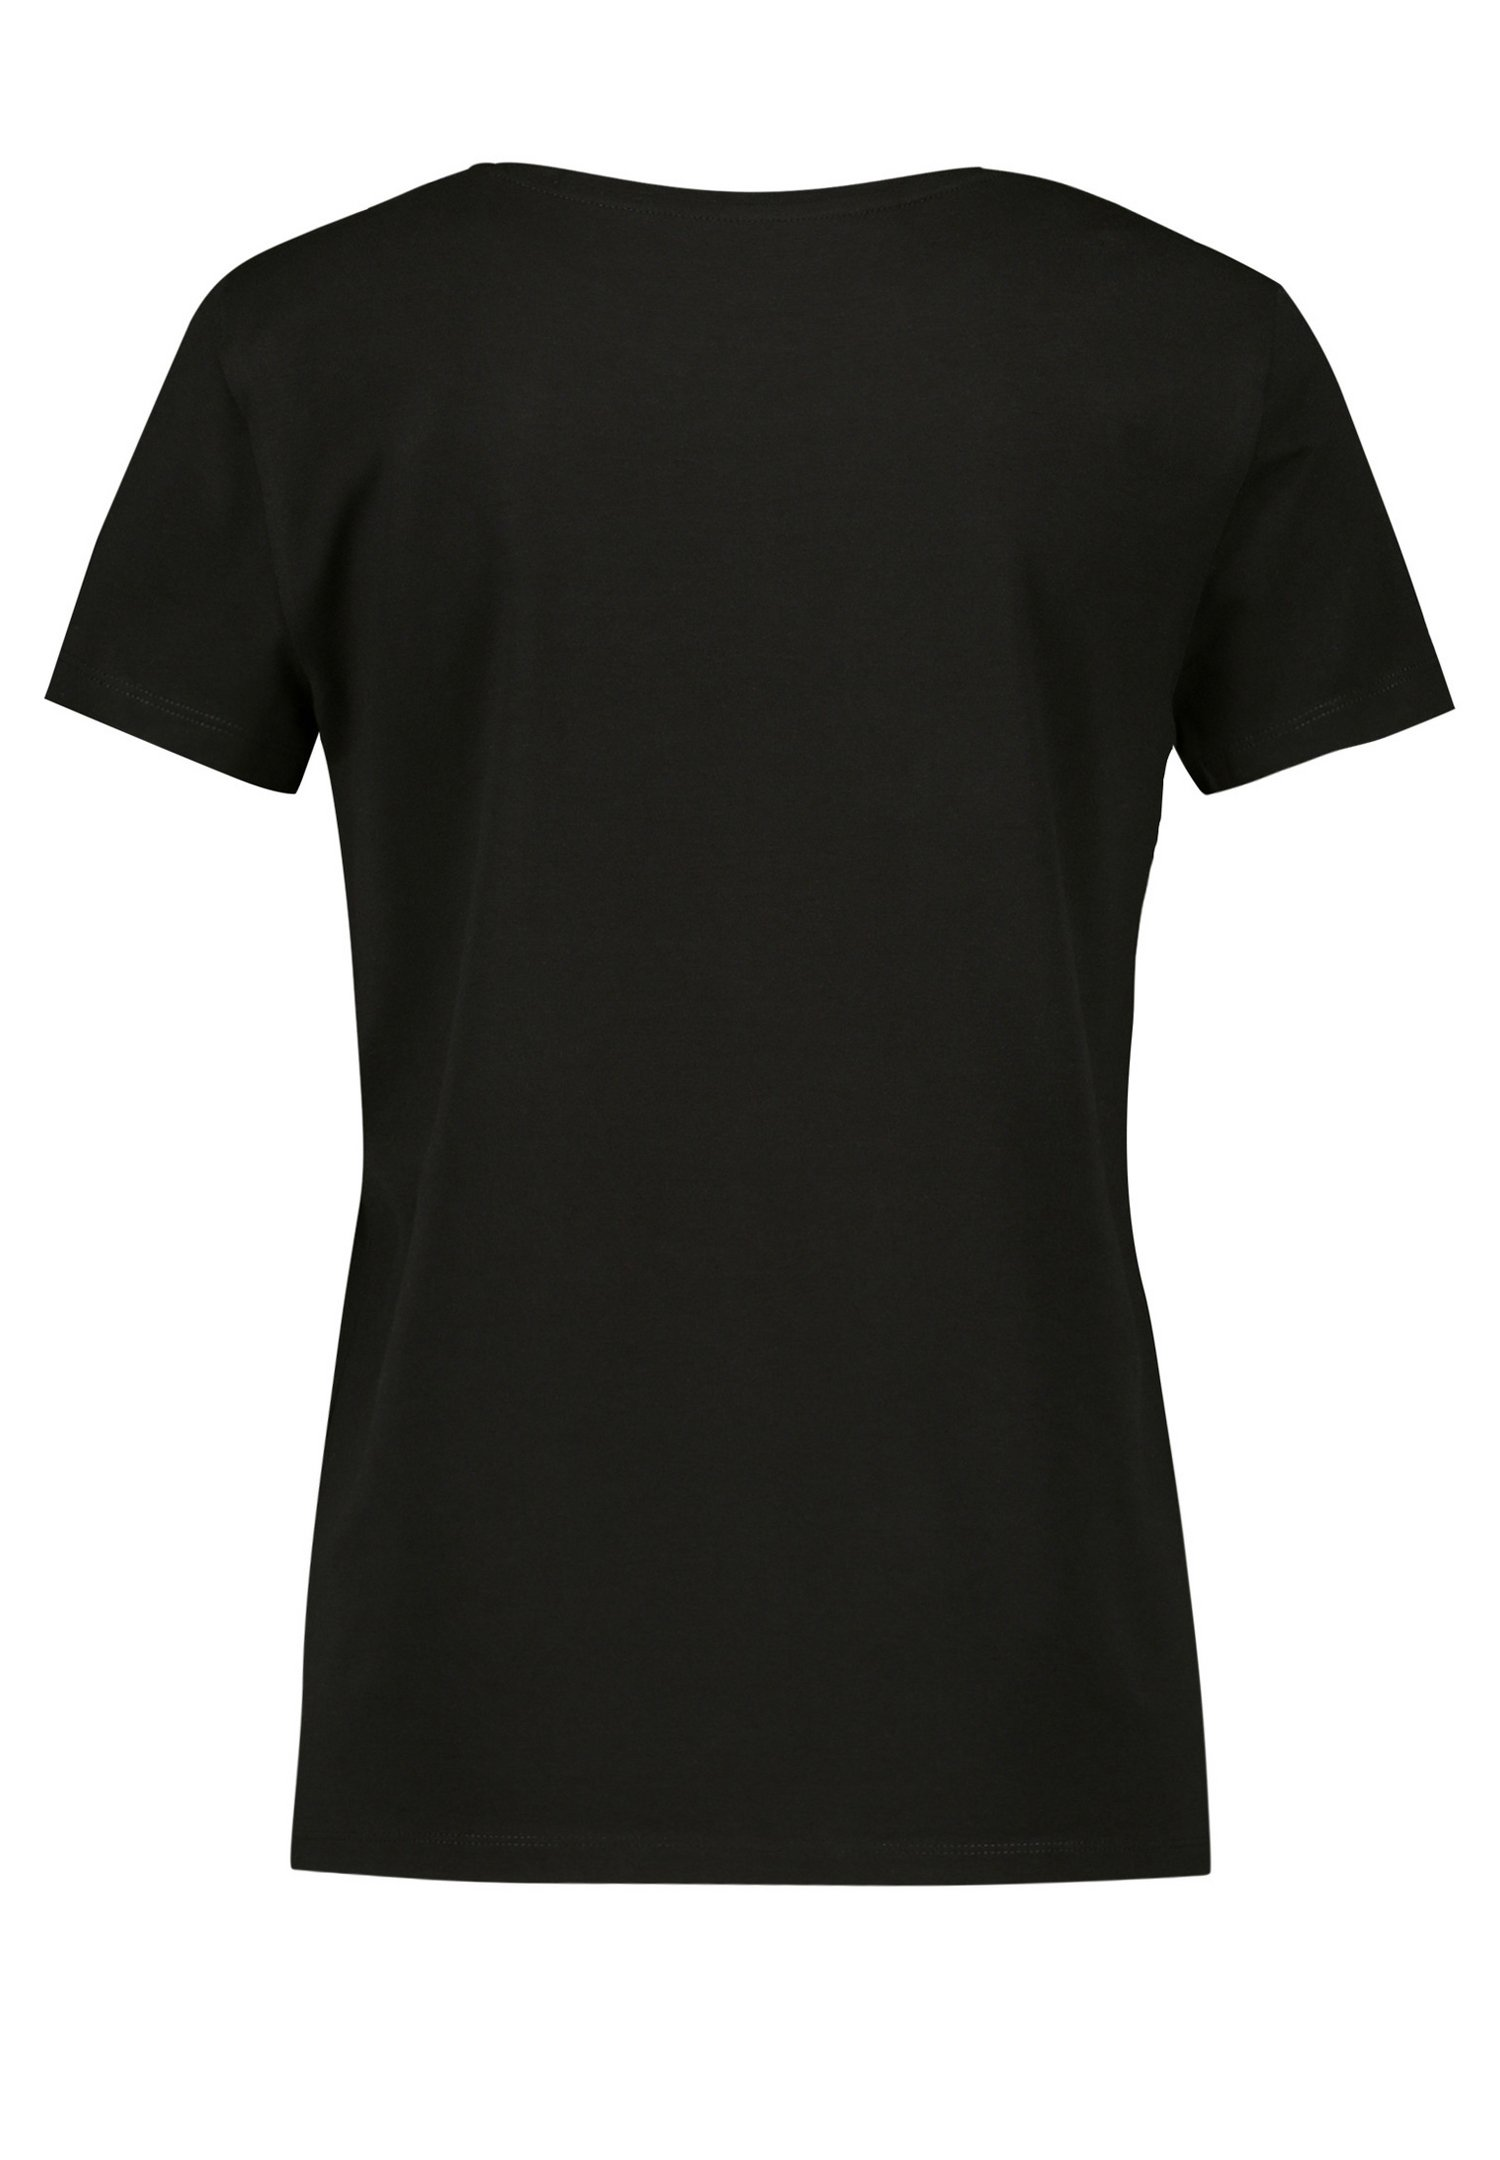 Taifun T-shirt Imprimé - Black Gemustert